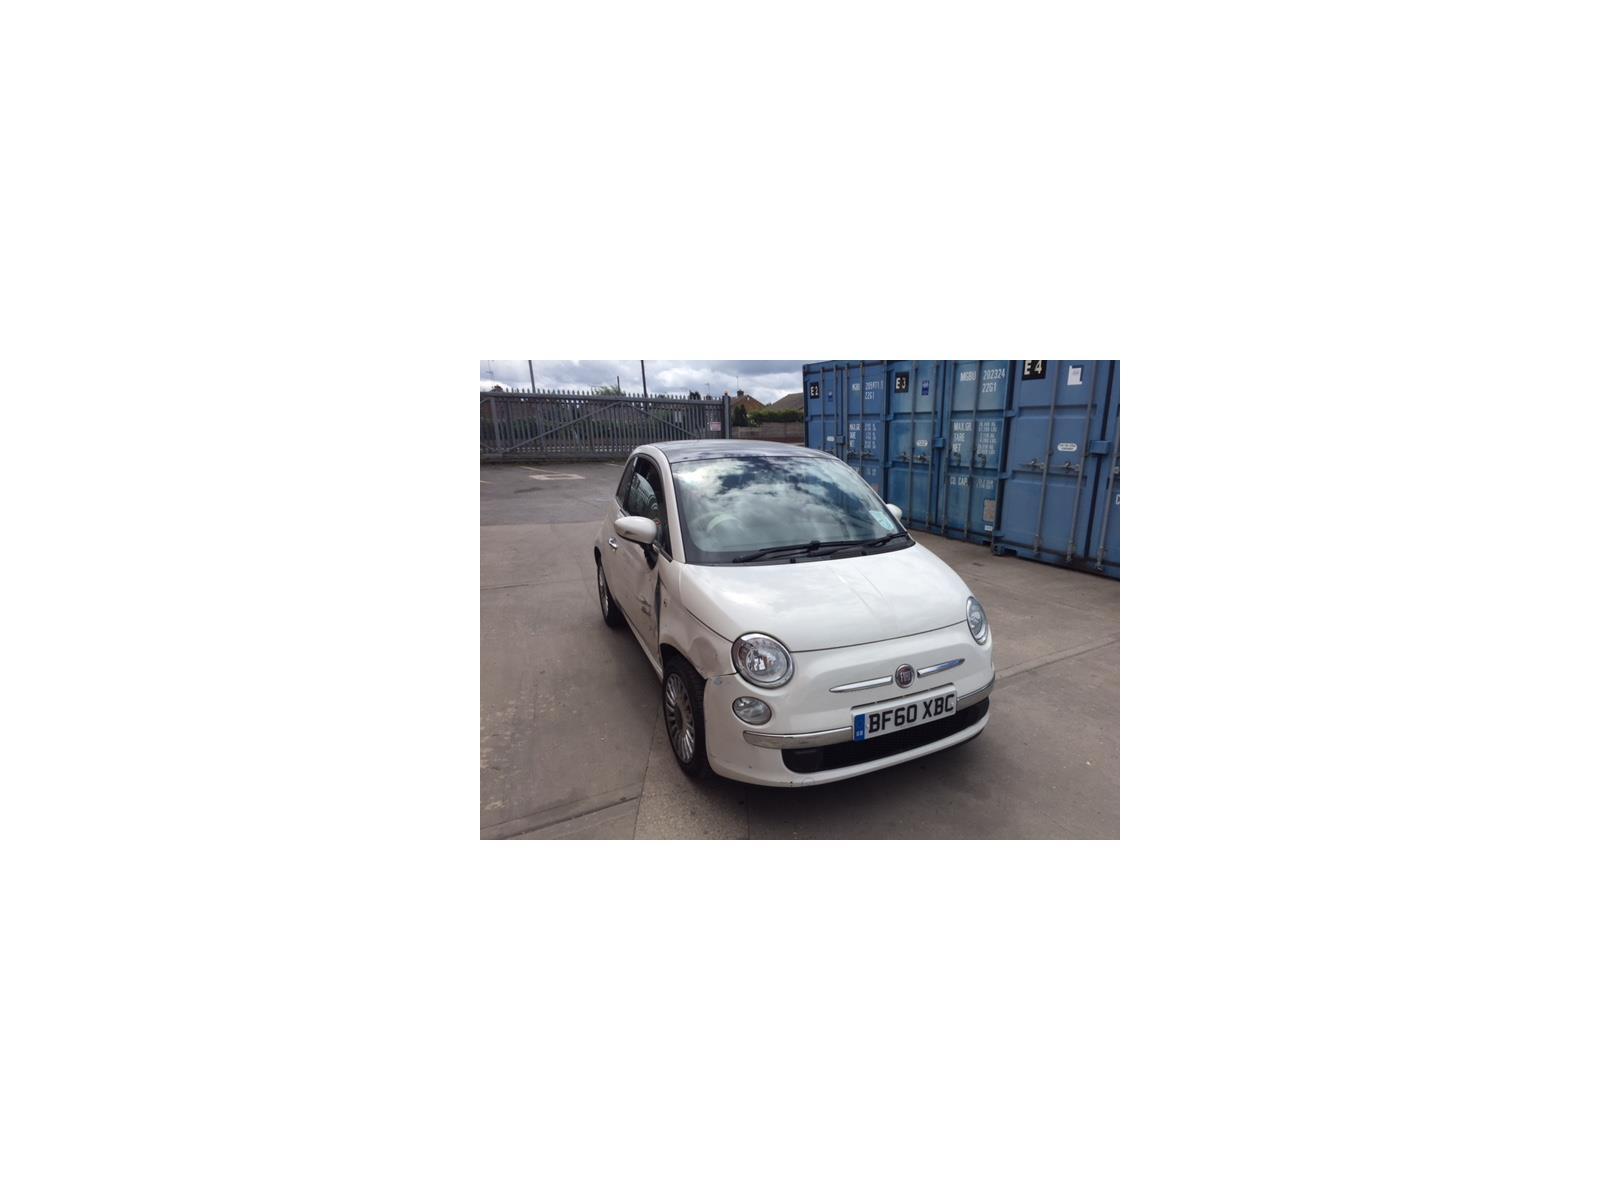 FIAT 500 LOUNGE IMG_6325